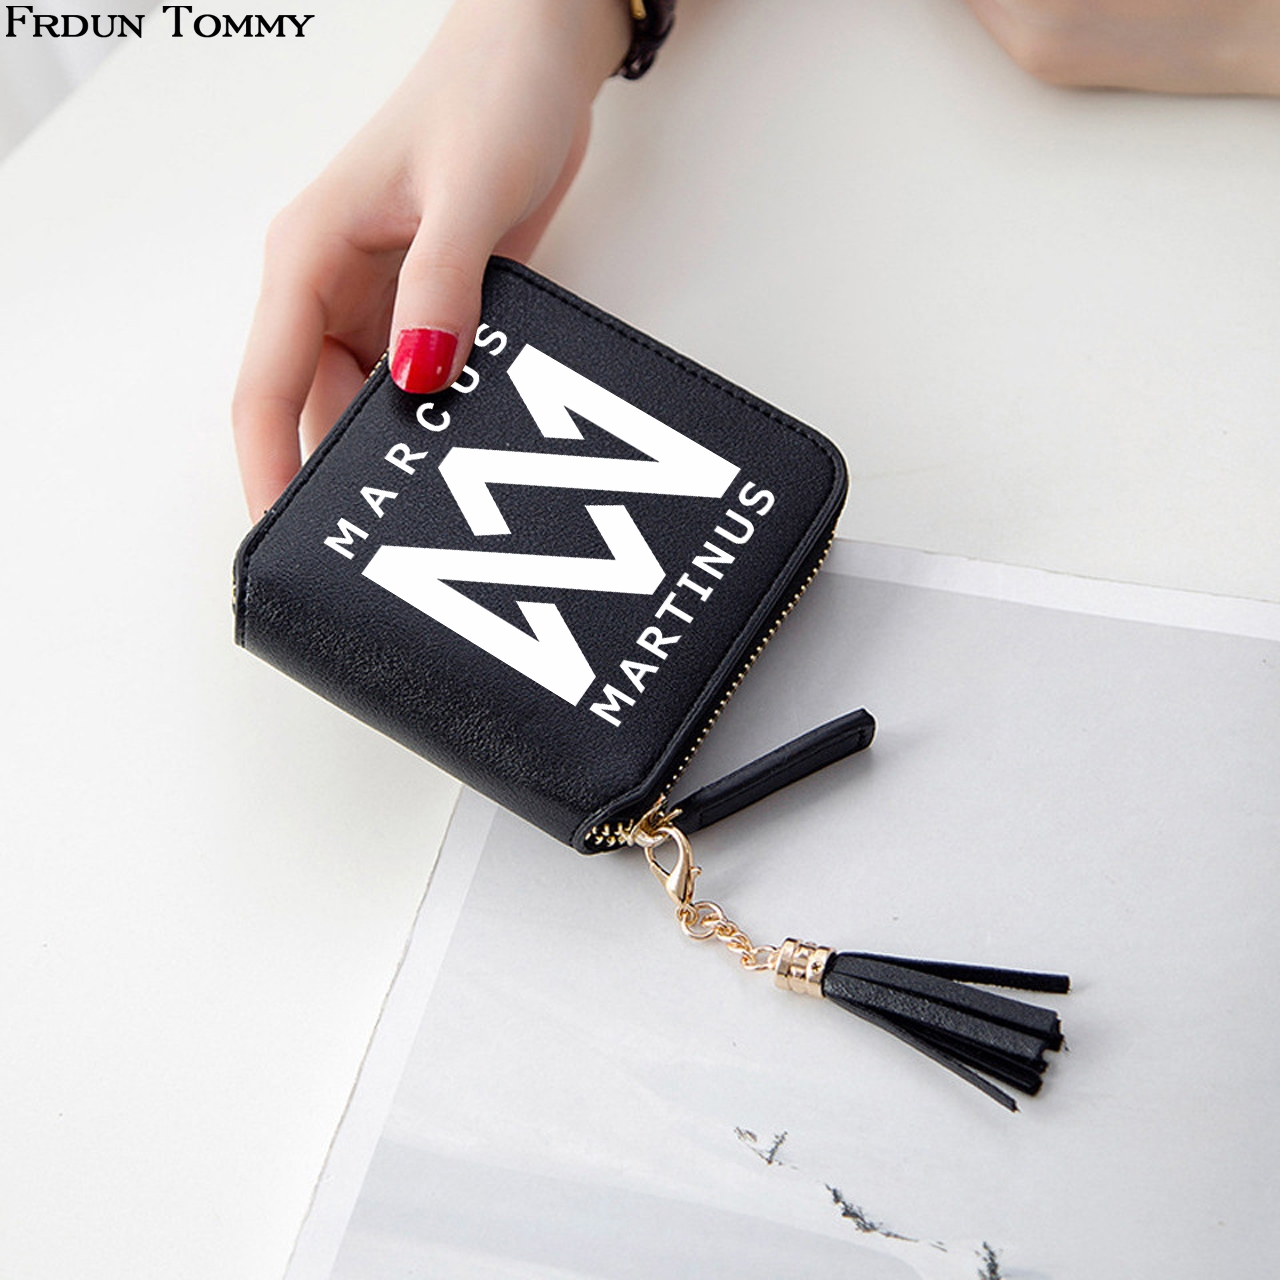 Frdun Tommy Marcus And Martinus Wallets Mini 3D Print Bags Women Wallets Short Zipper Card Wallet Girl Tassel Wallets And Purses